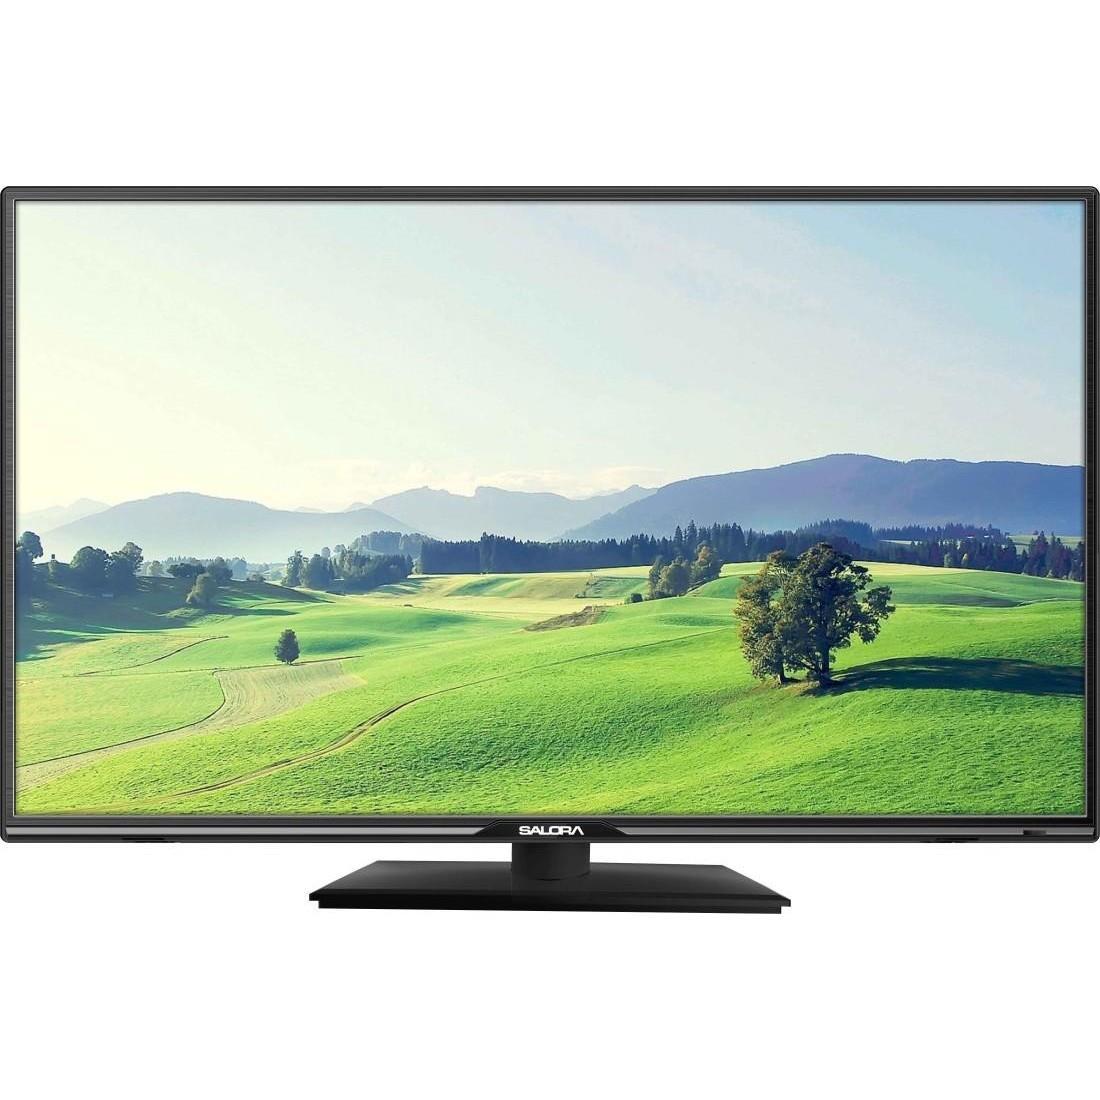 Salora SLV 4322 80 cm (31.5) LED TV (HD Ready) Image